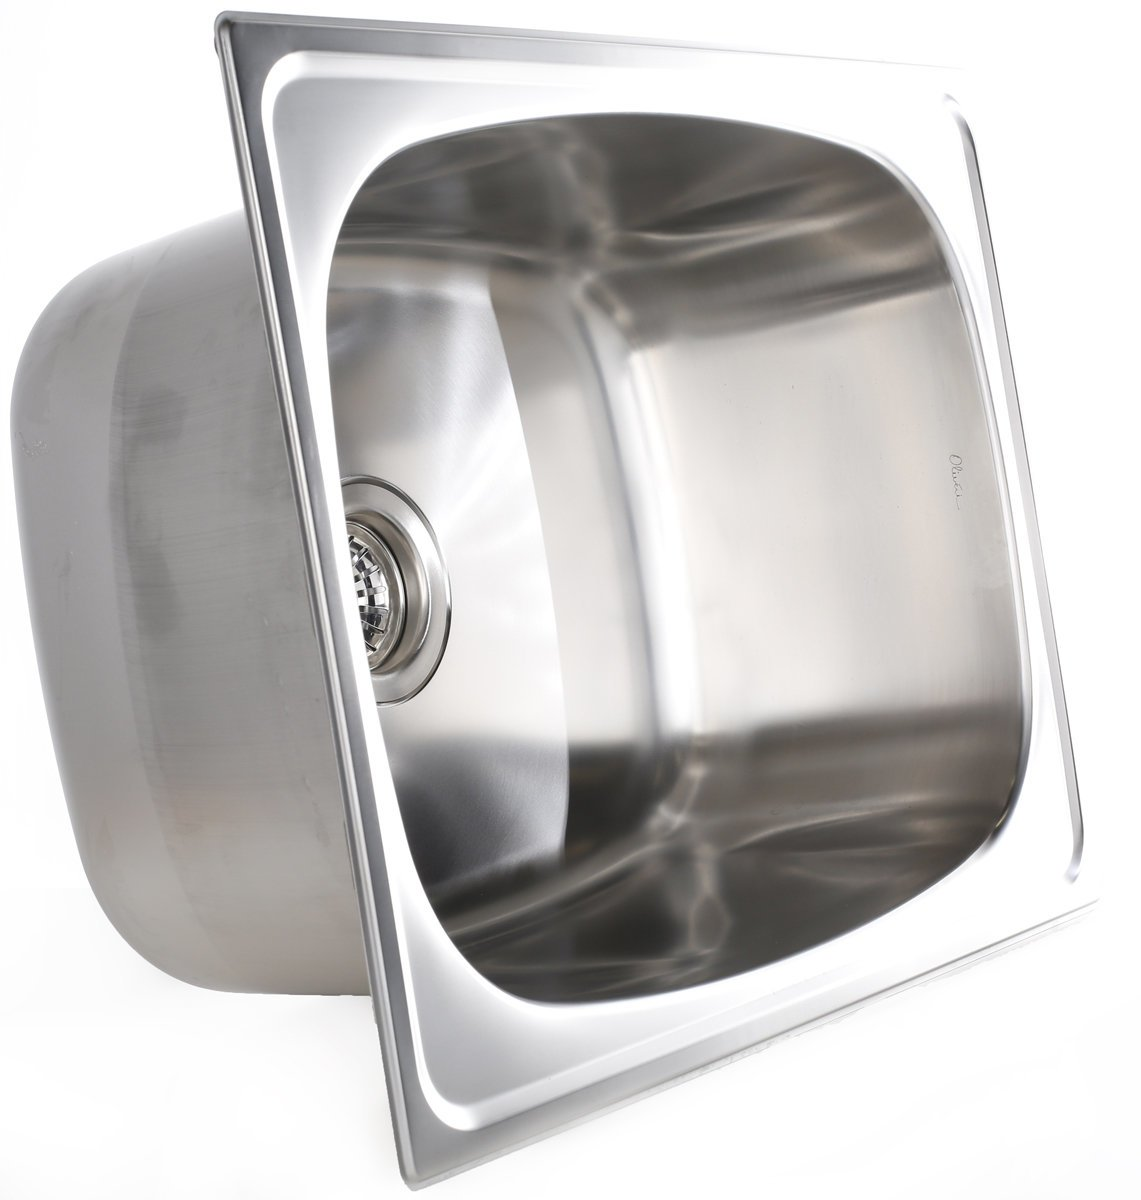 Laundry sink ebay - New Oliveri Ti45 Laundry Tub